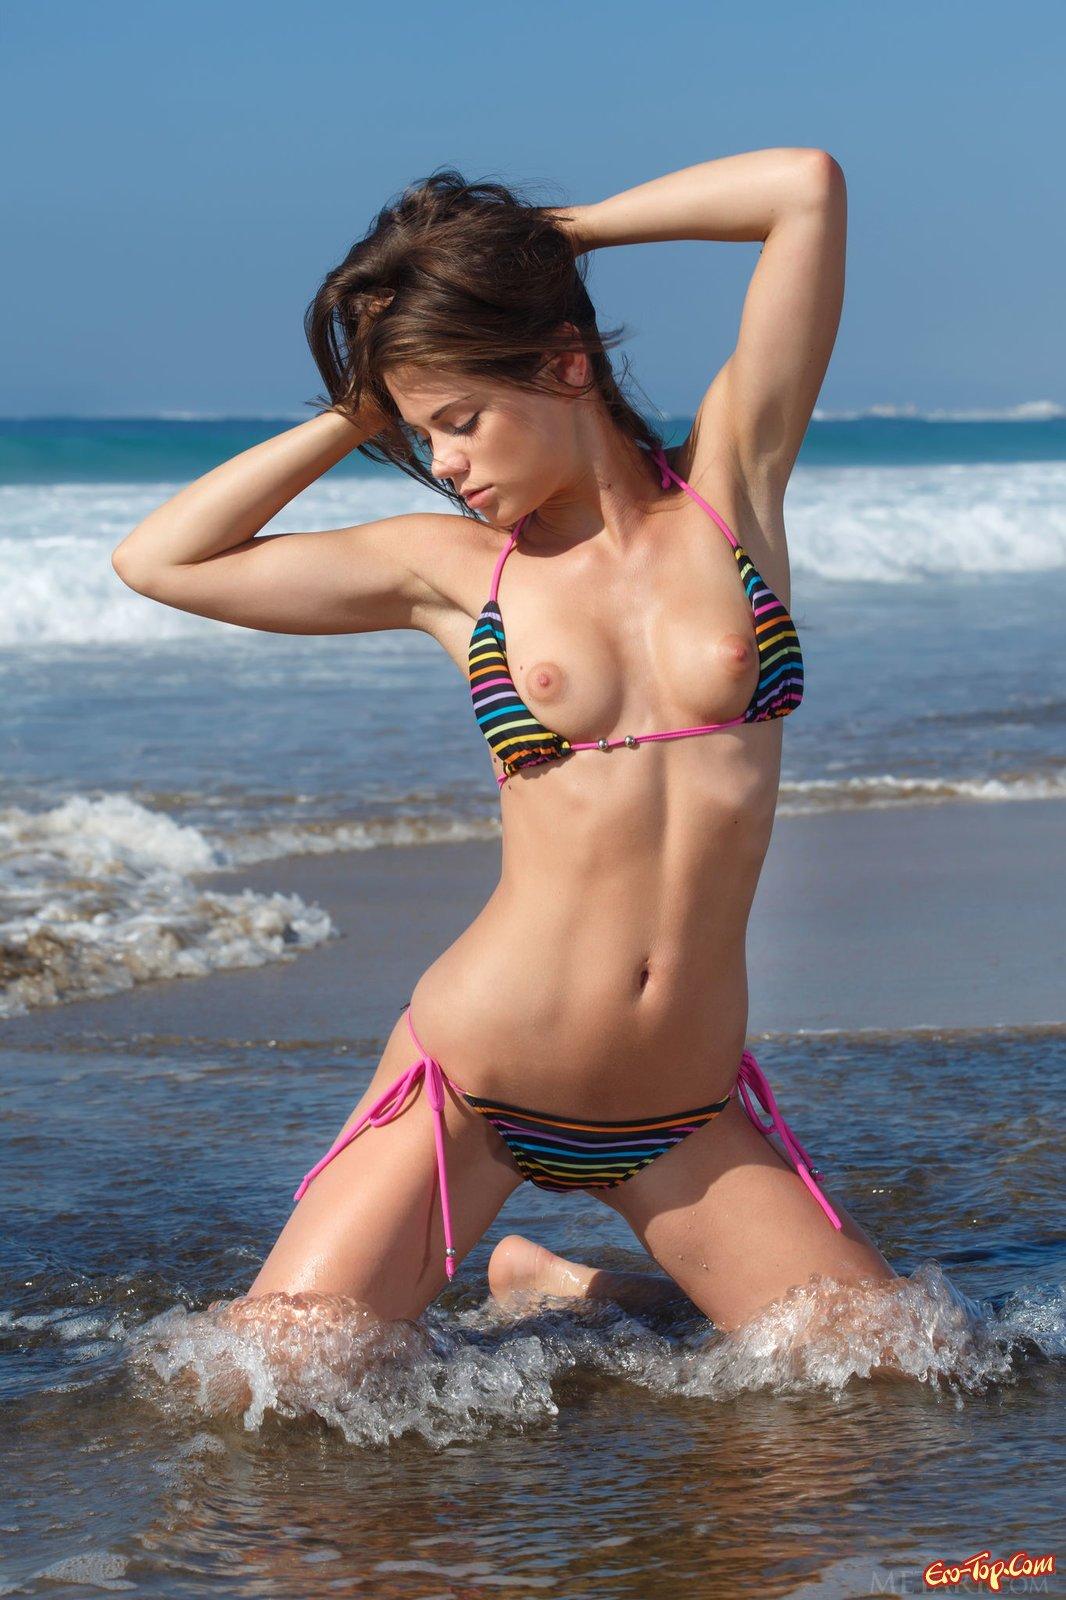 Красавица в купальнике делает селфи около океана